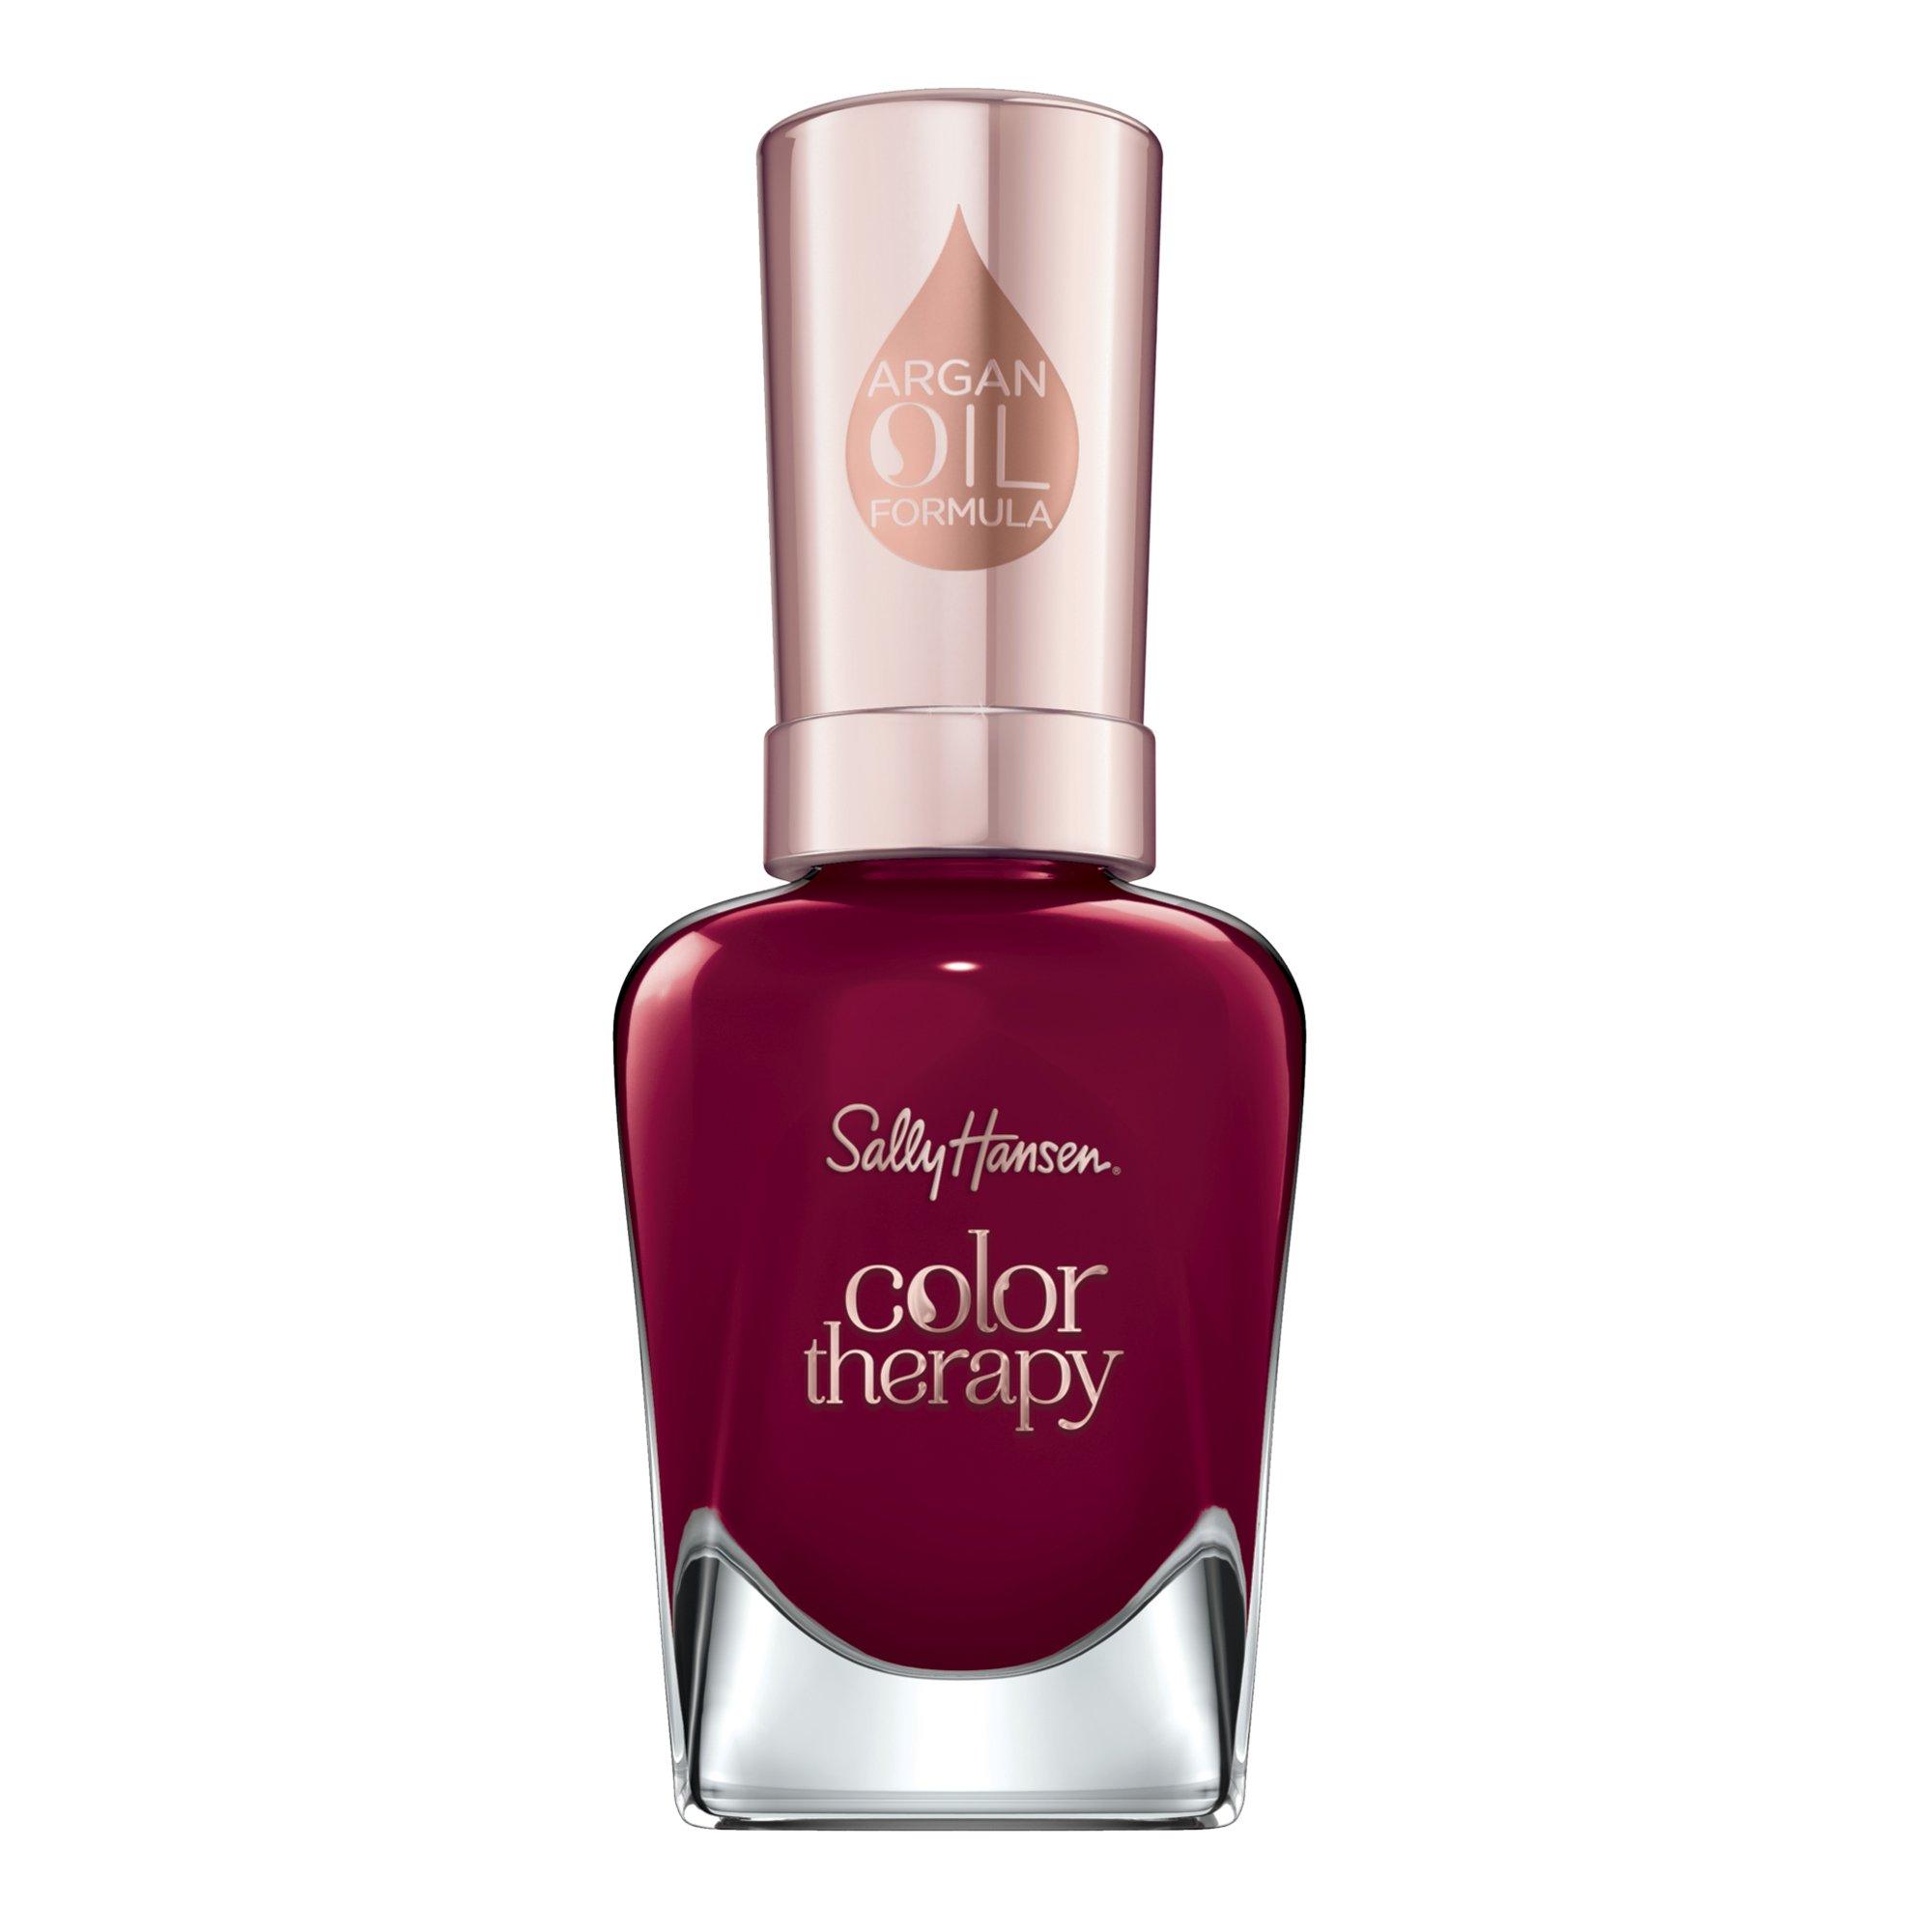 Sally Hansen - Sally Hansen Color Therapy Nail Polish, Unwine'd, Pack of 1